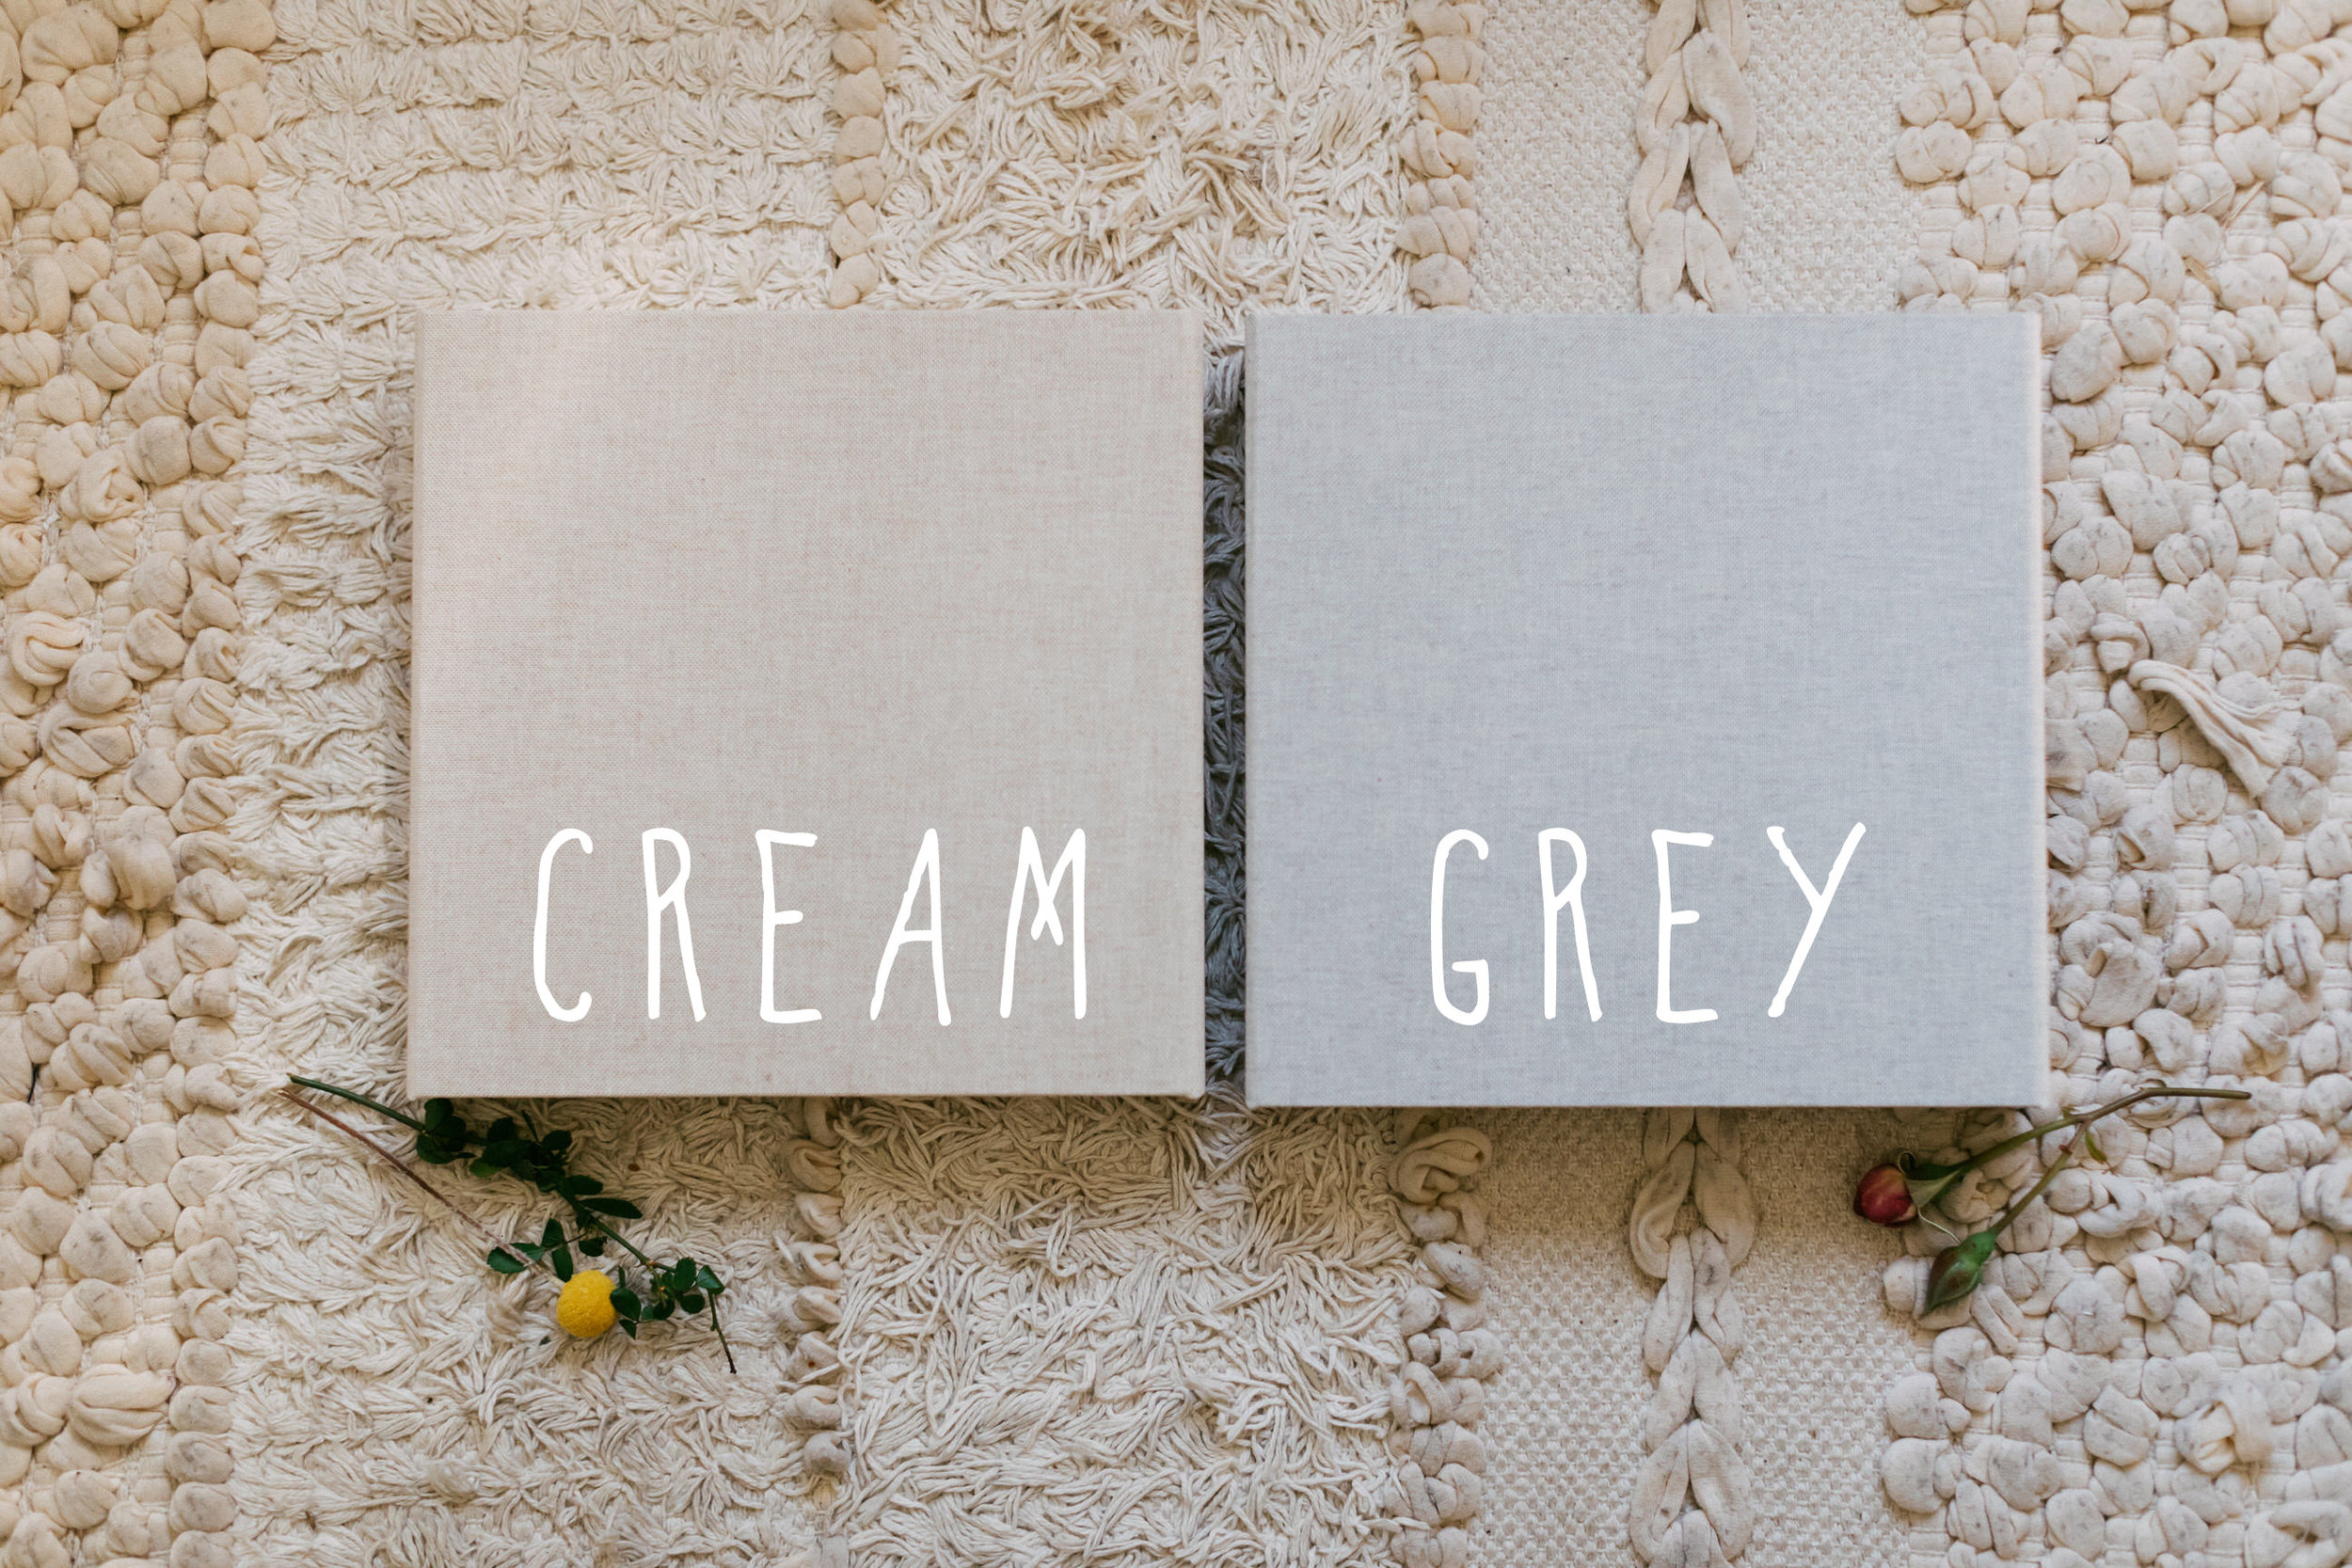 Cream vs Grey